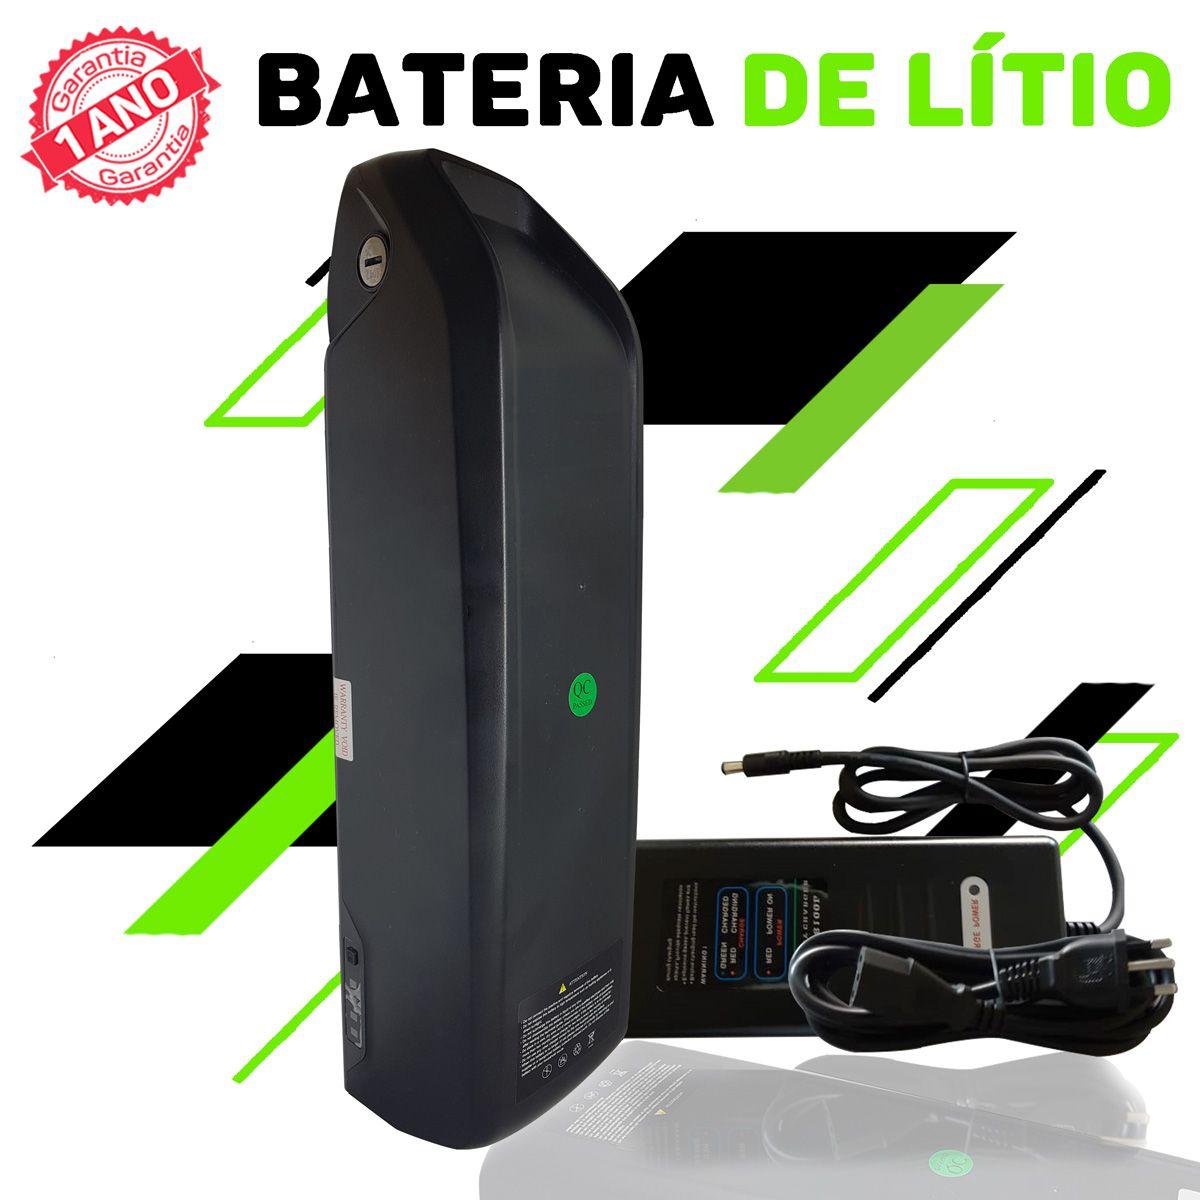 Kit Elétrico para Bicicleta - TecBike - Bateria Preta - 500 Watts 36V - Aro 26